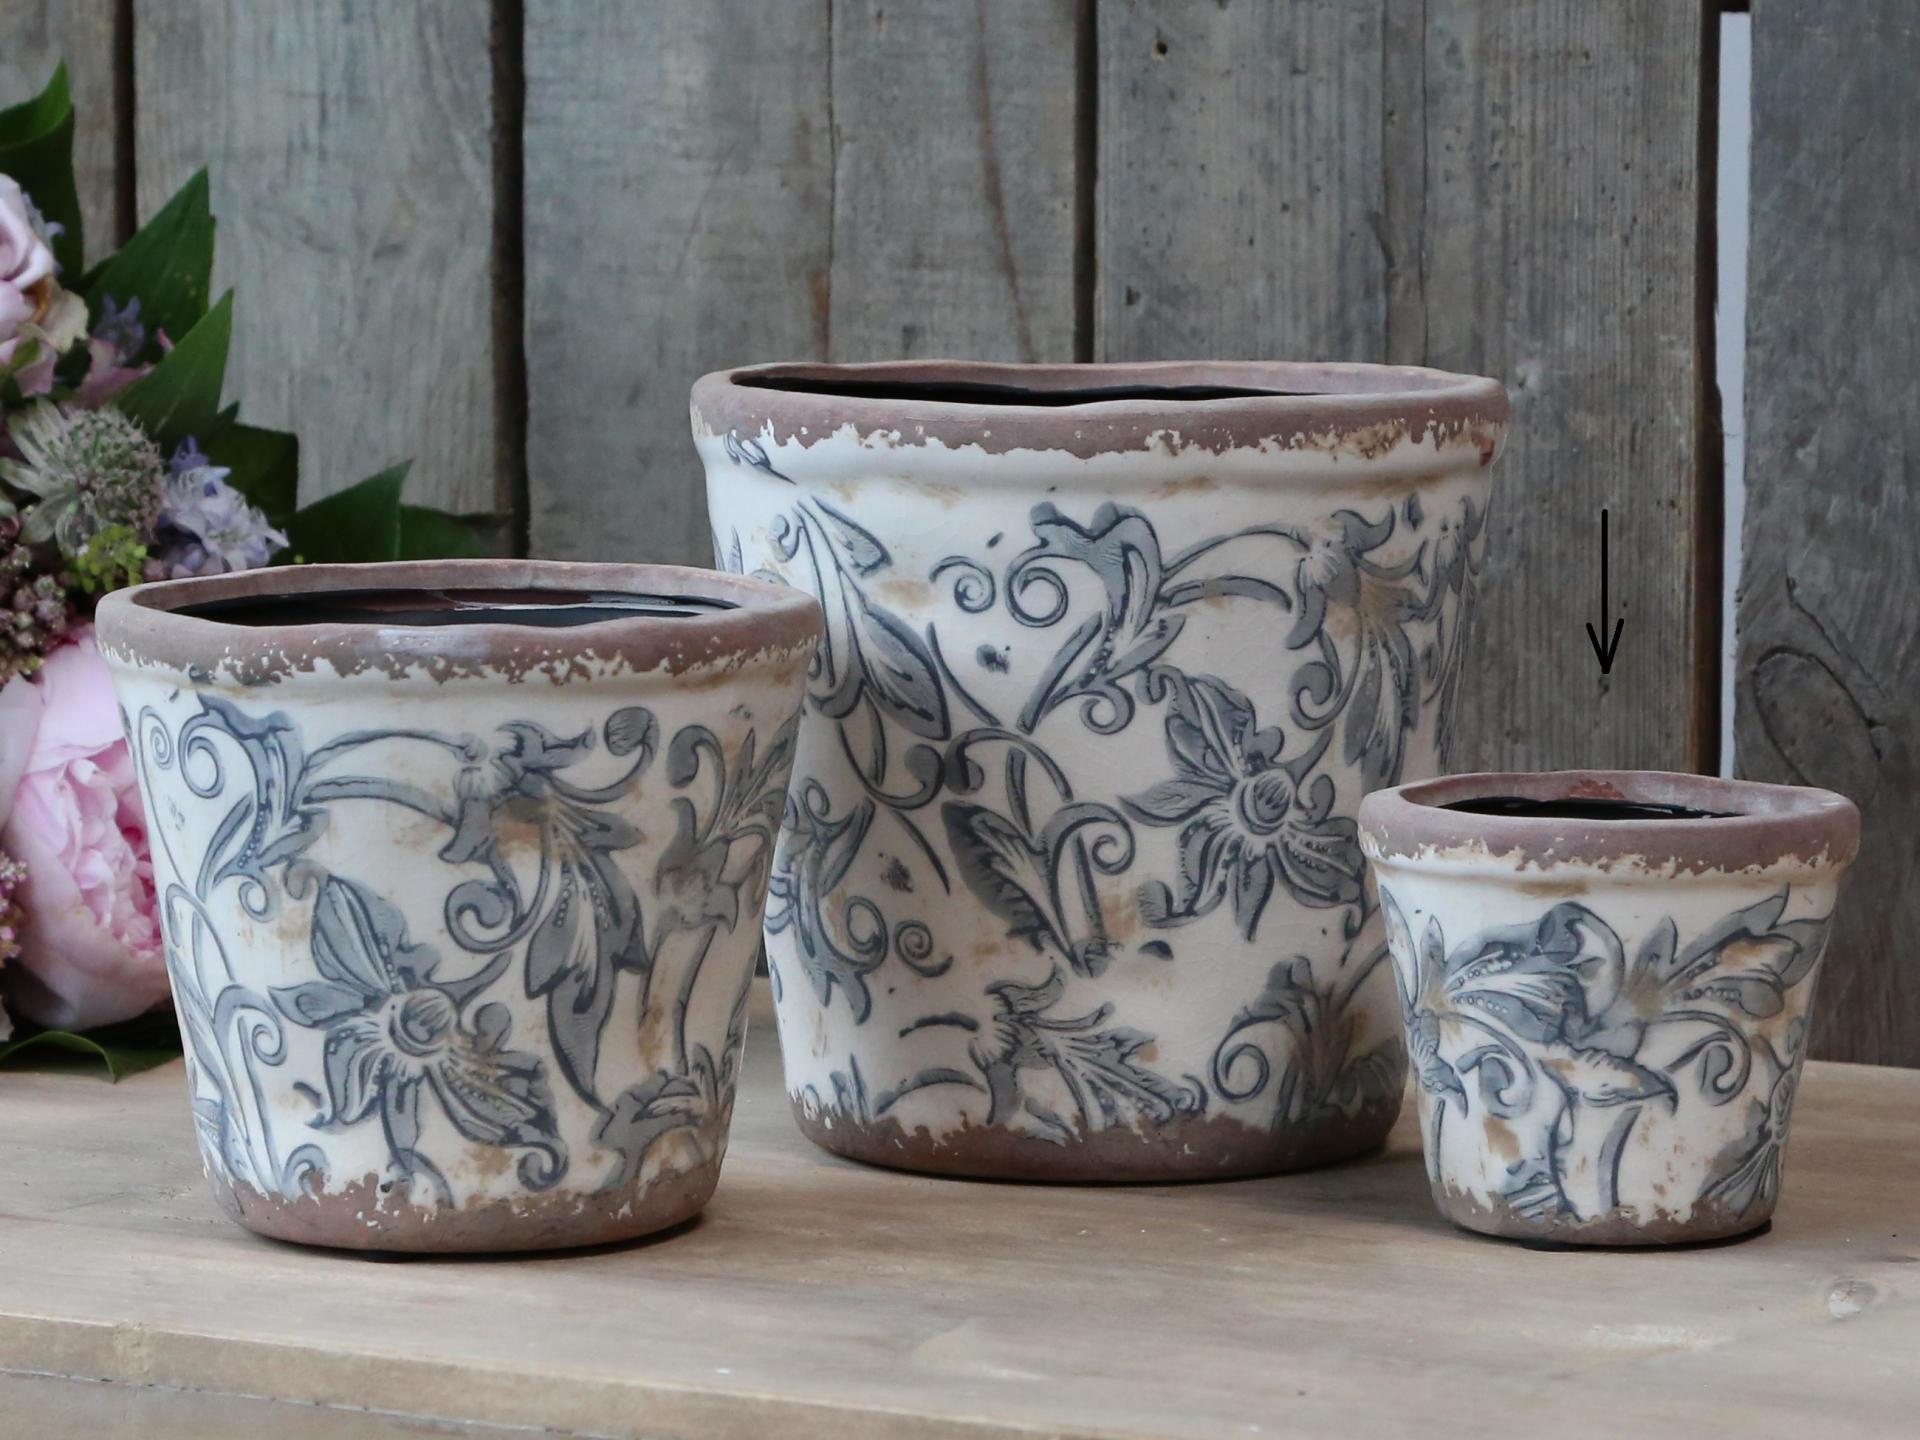 Chic Antique Obal na květiny Pattern French, modrá barva, keramika